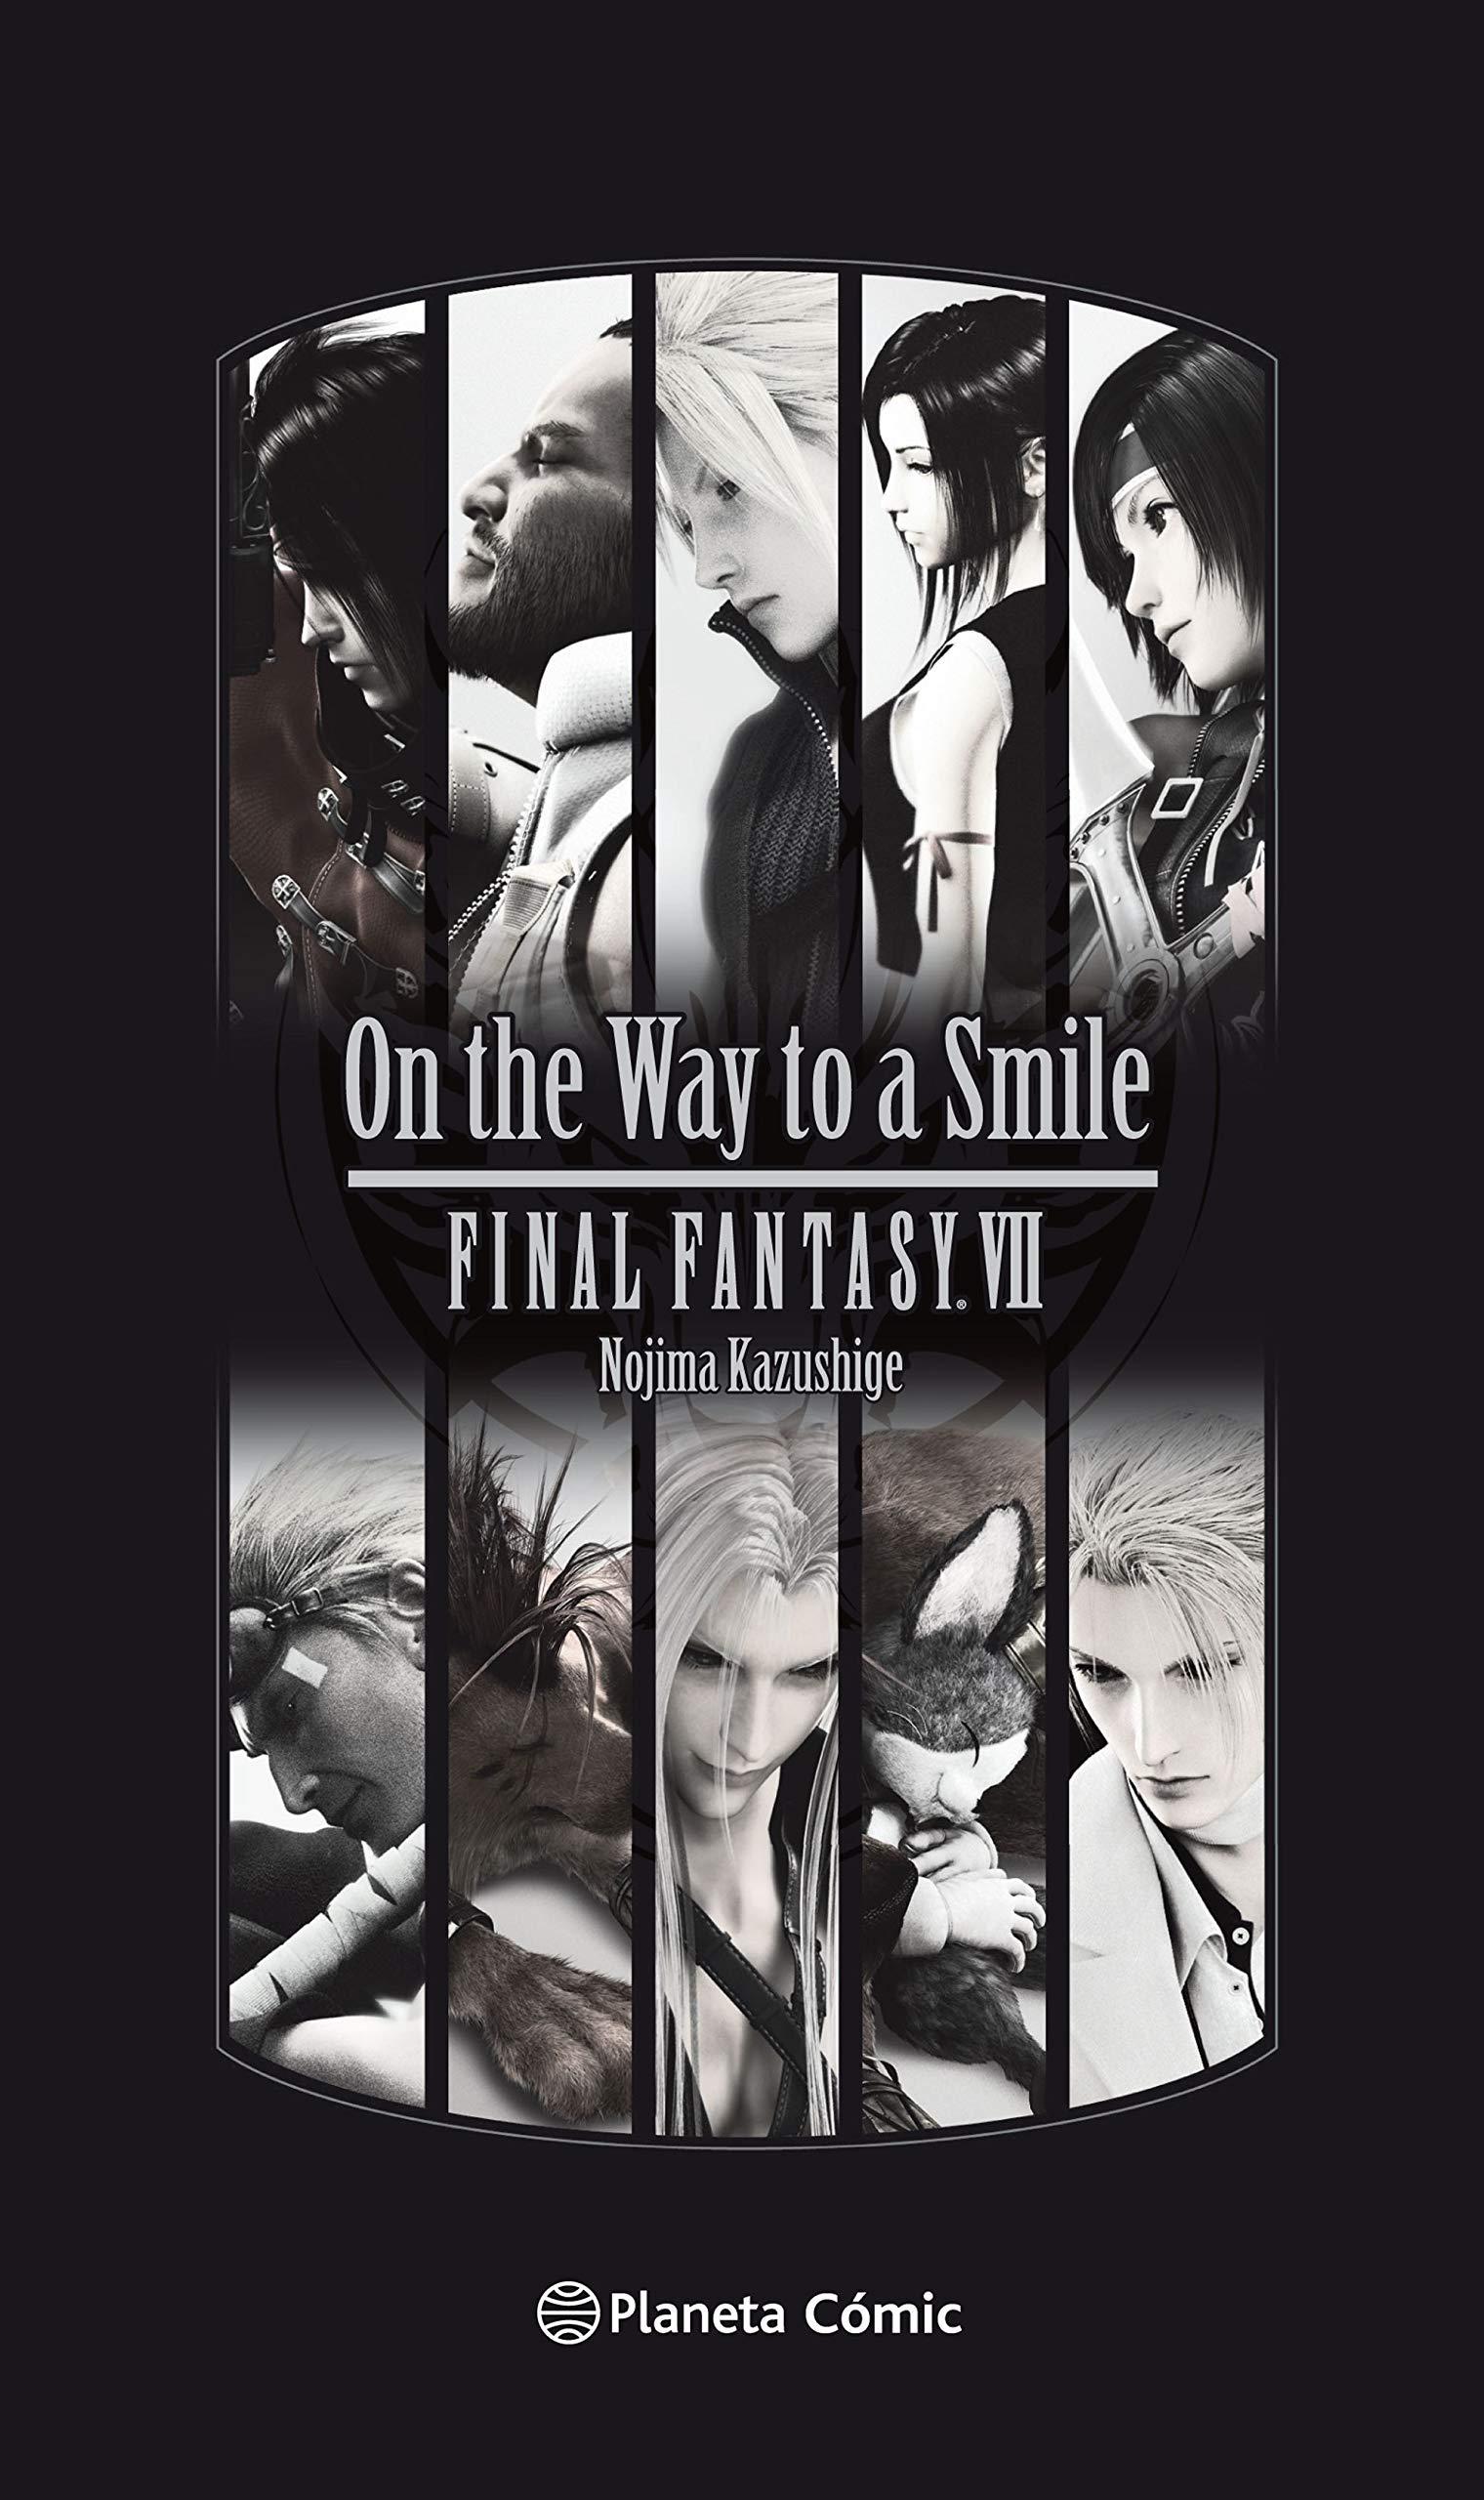 Final Fantasy VII (novela): On the Way to a Smile (Manga Shonen)